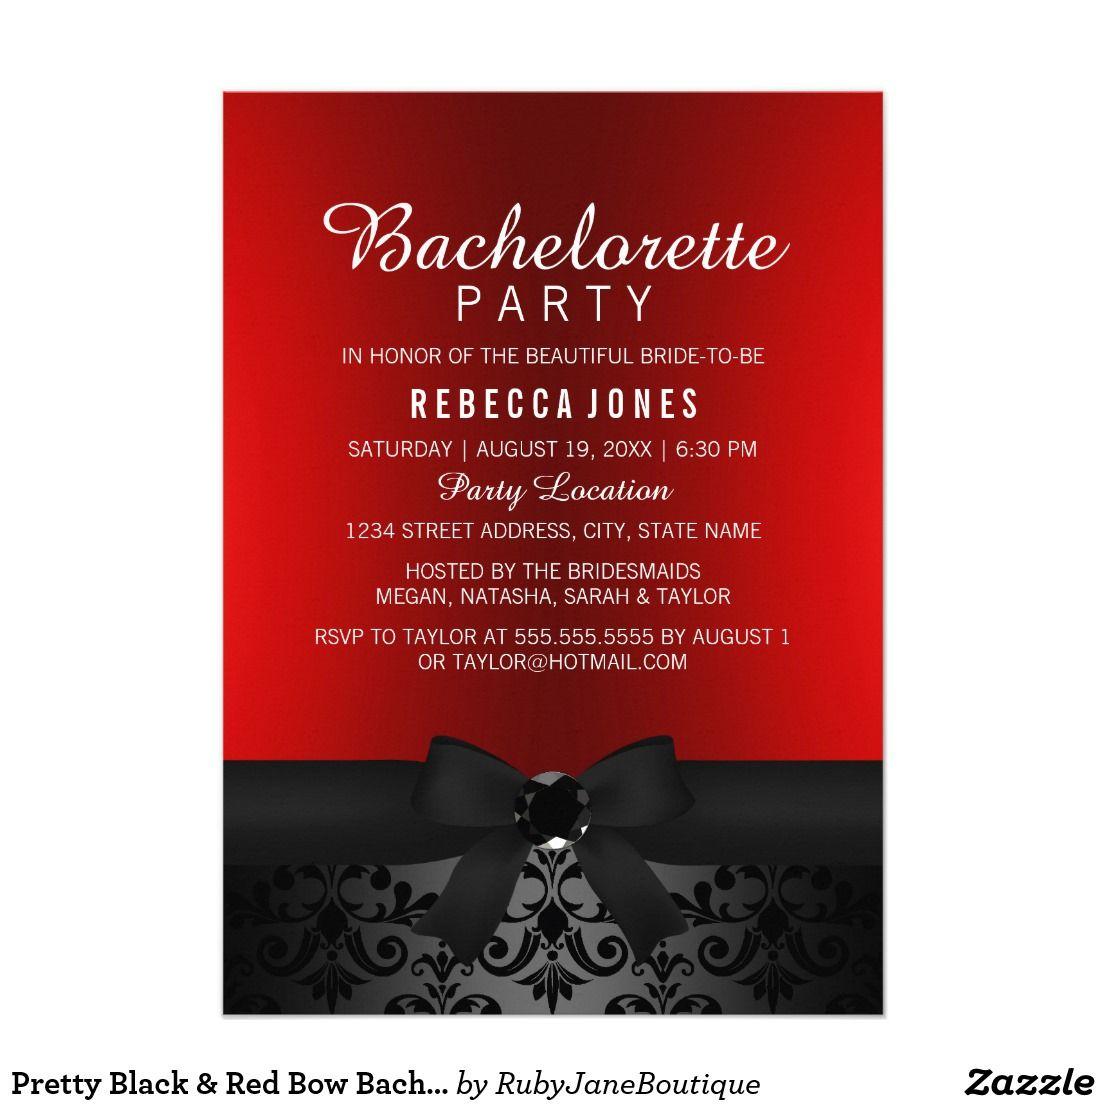 Pretty Black & Red Bow Bachelorette Party Invite | Pinterest ...